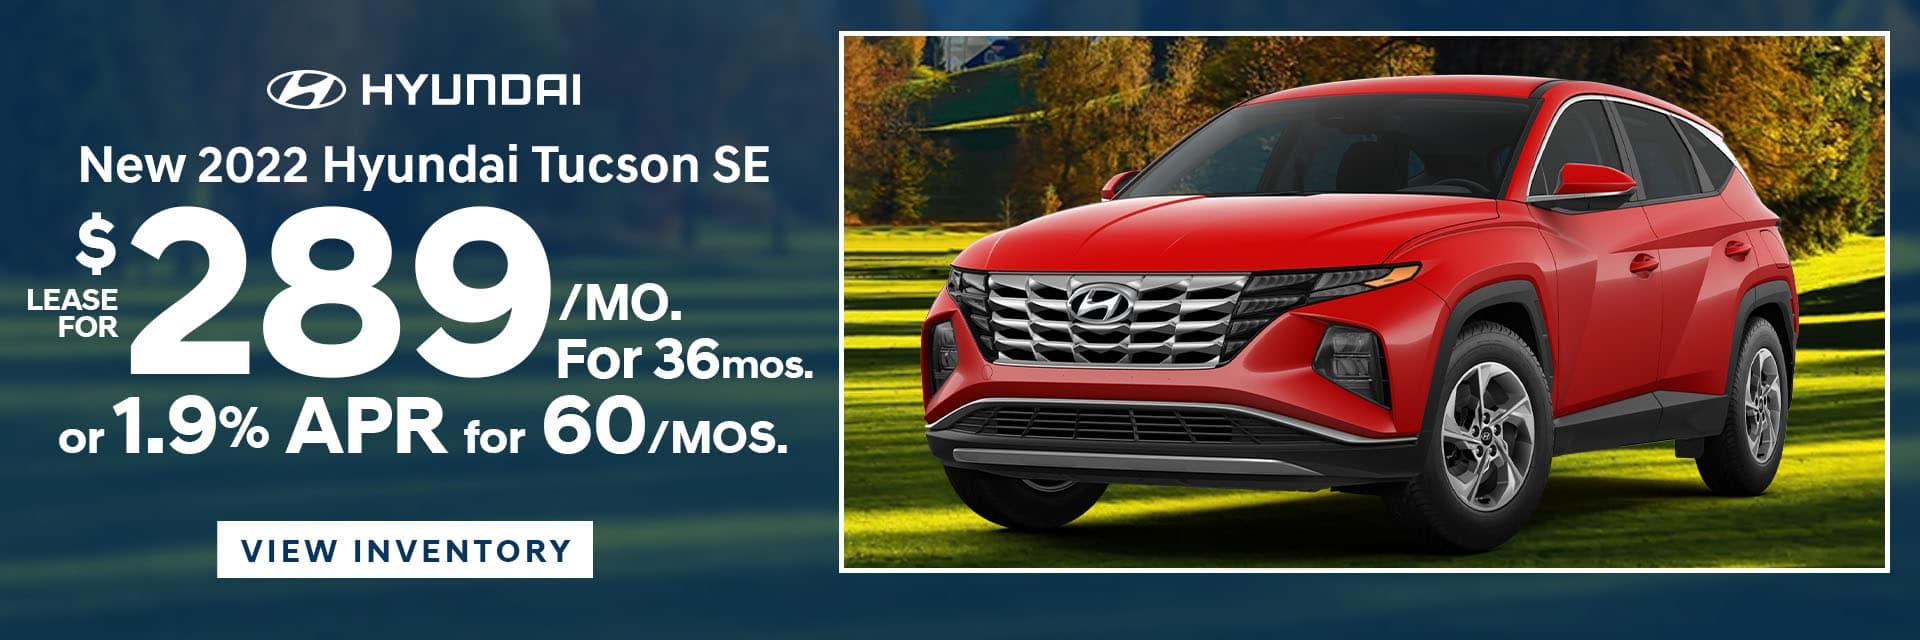 CHOH-October 20212021 Hyundai Tucson copy